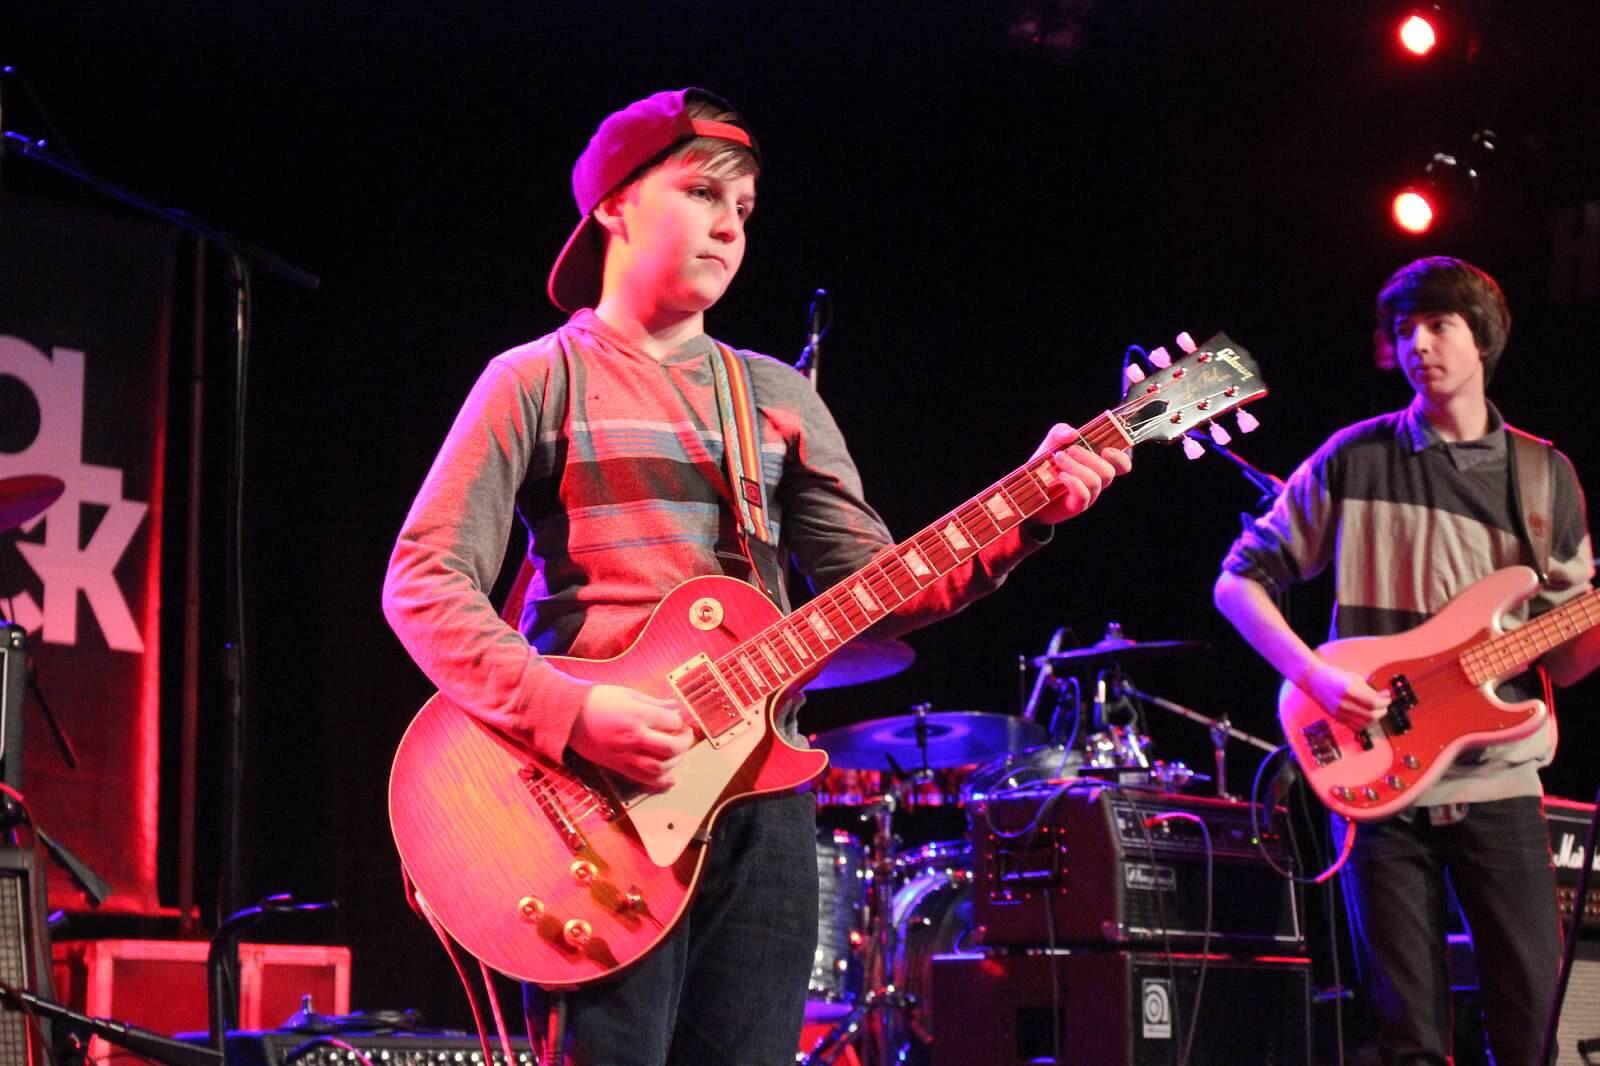 Jersey-Sullivan_hard-rock-cafe-benefit-guitar-3.jpg